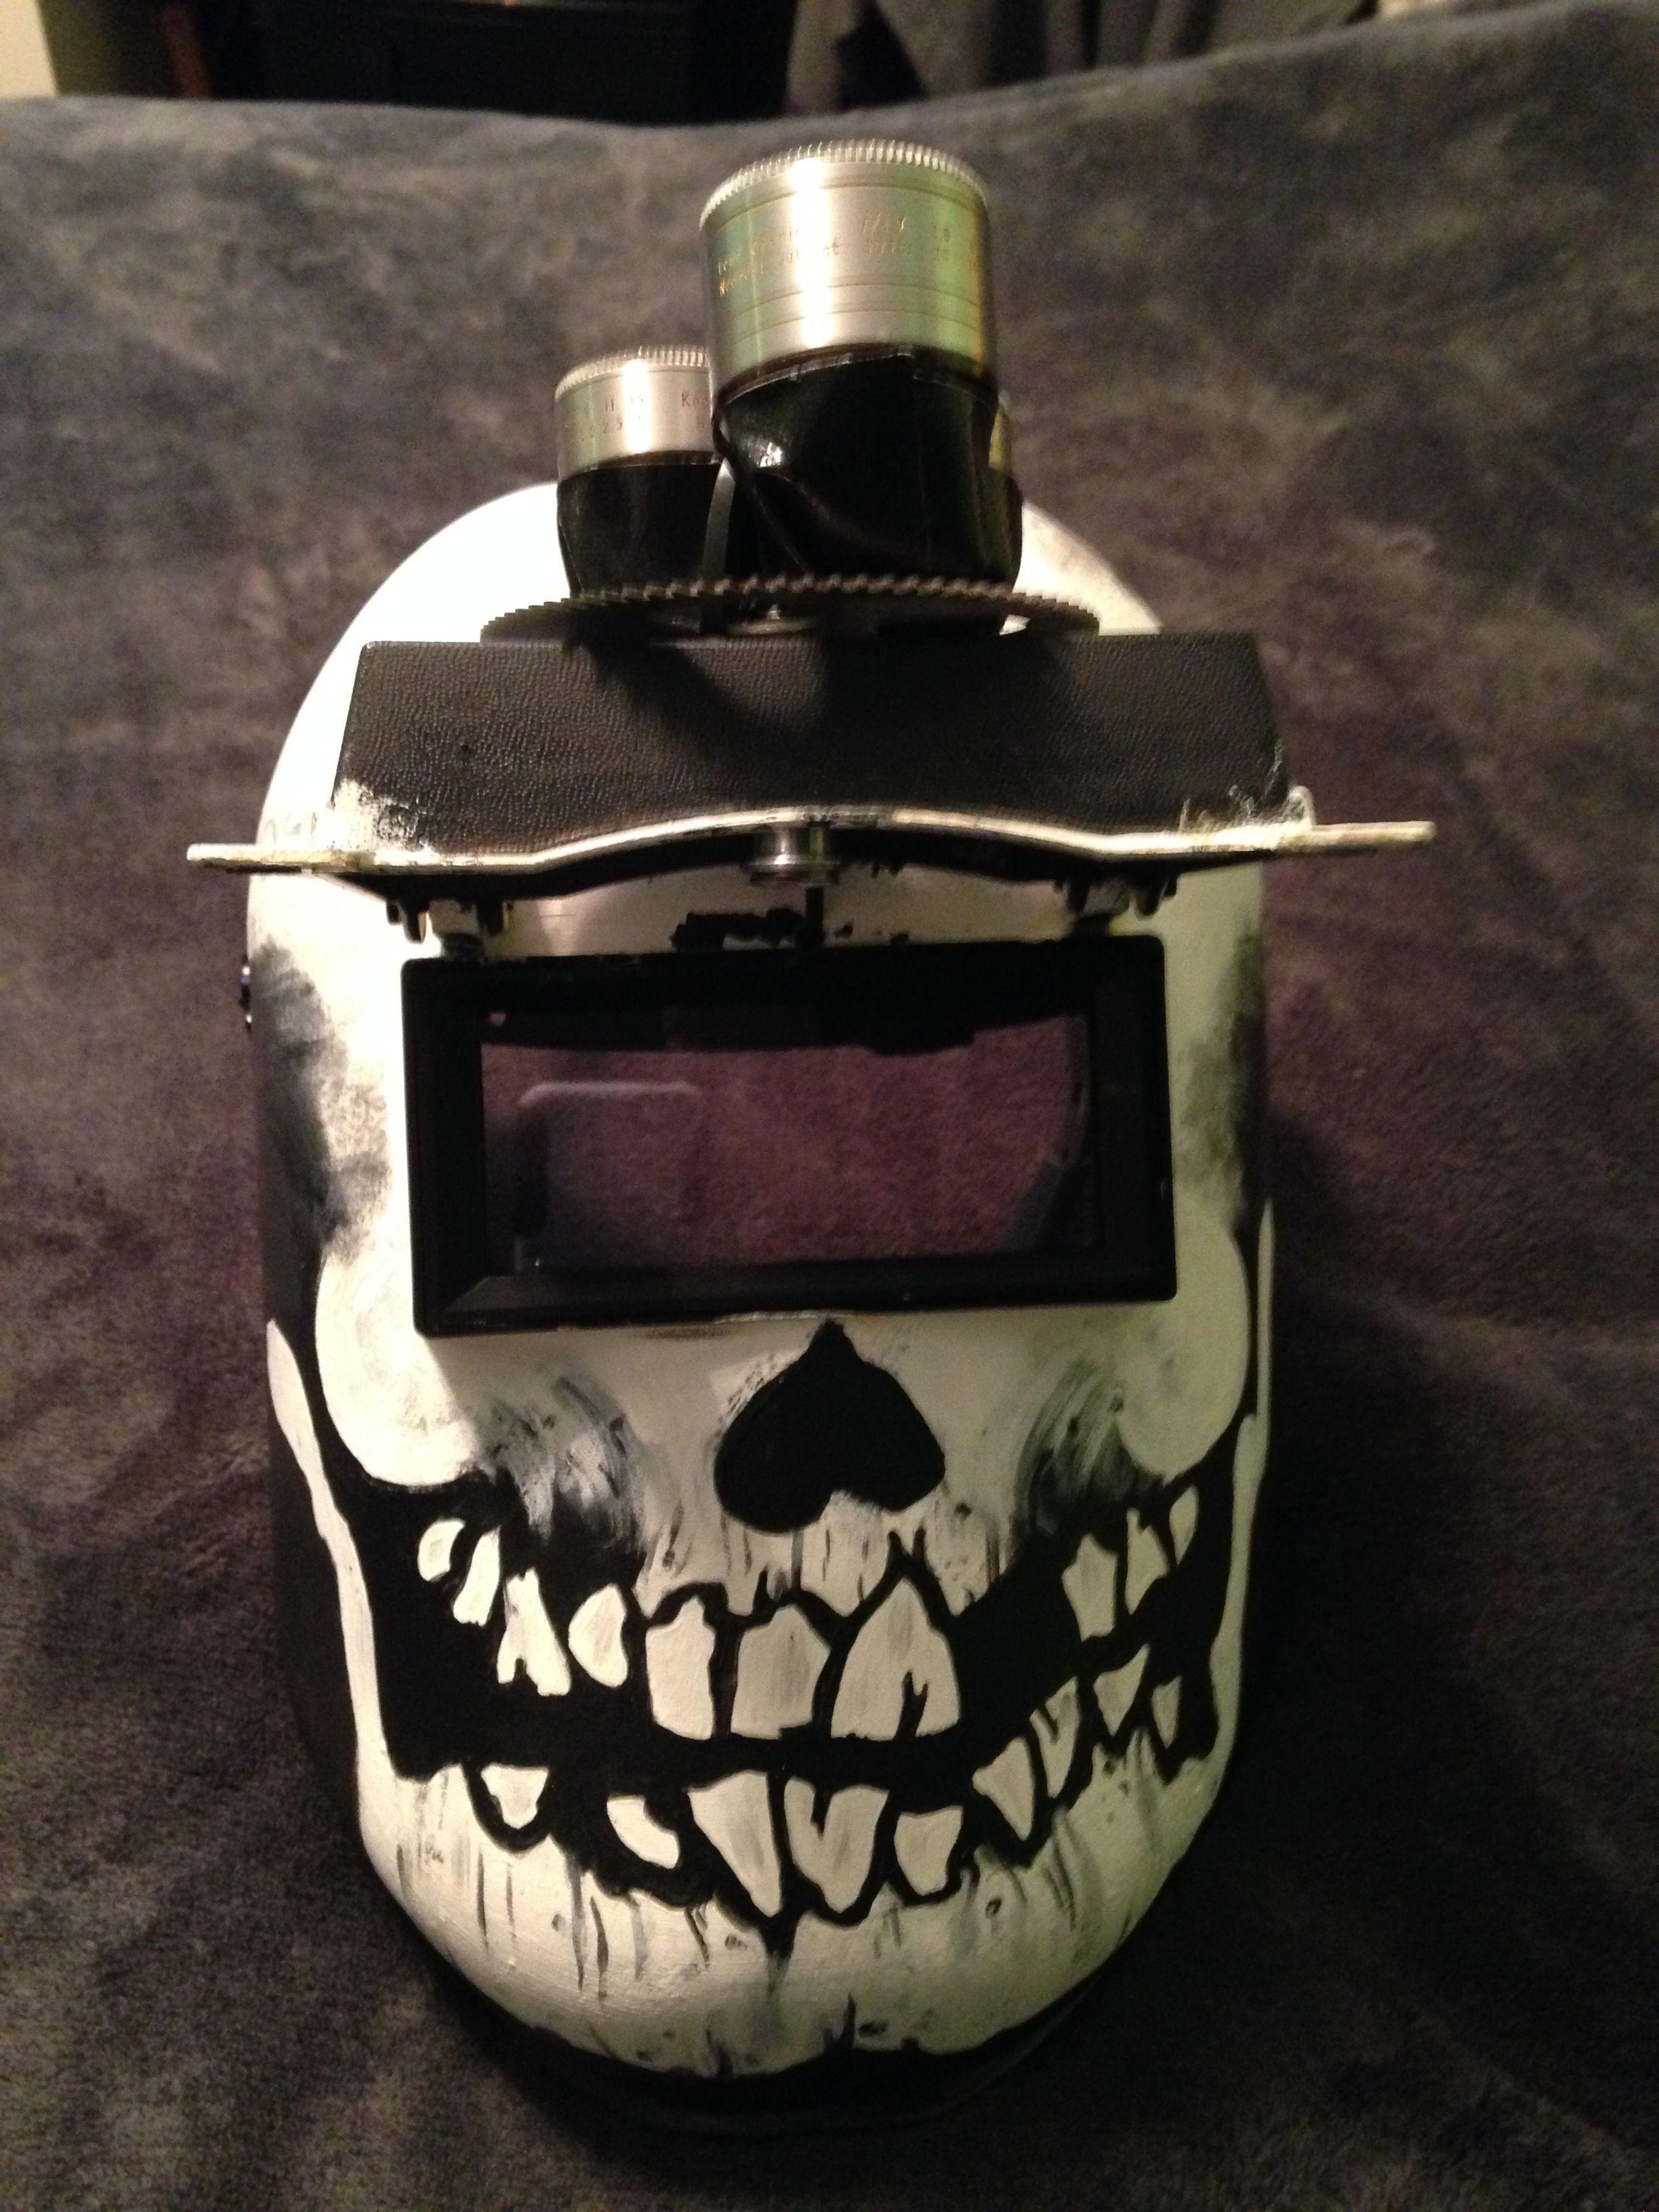 Wybie Mask w 3 lens turret up Coraline halloween costume